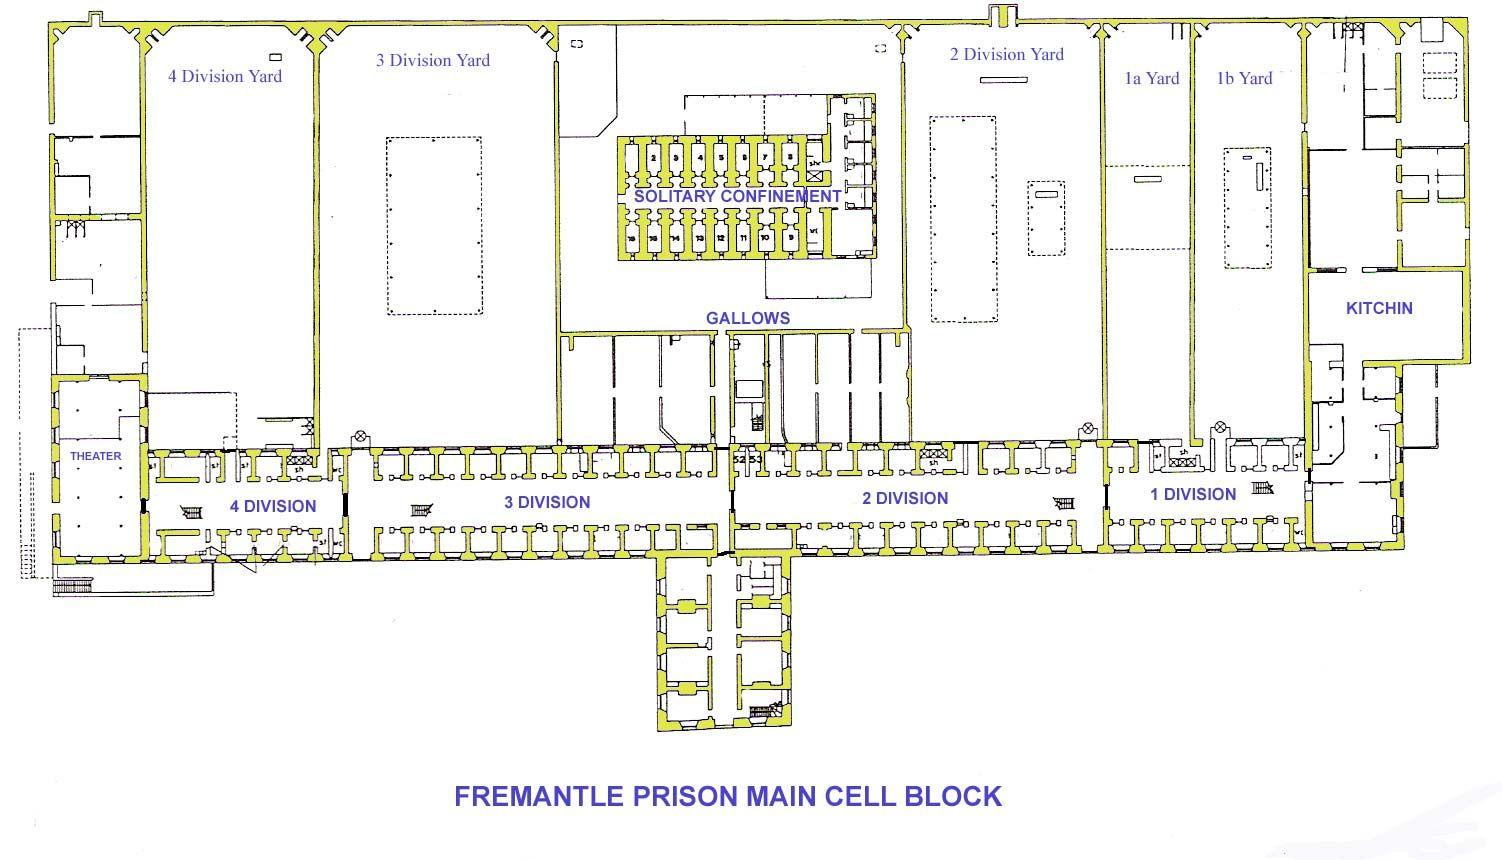 Https Www Google Com Search Q Maximum Security Prison Prison